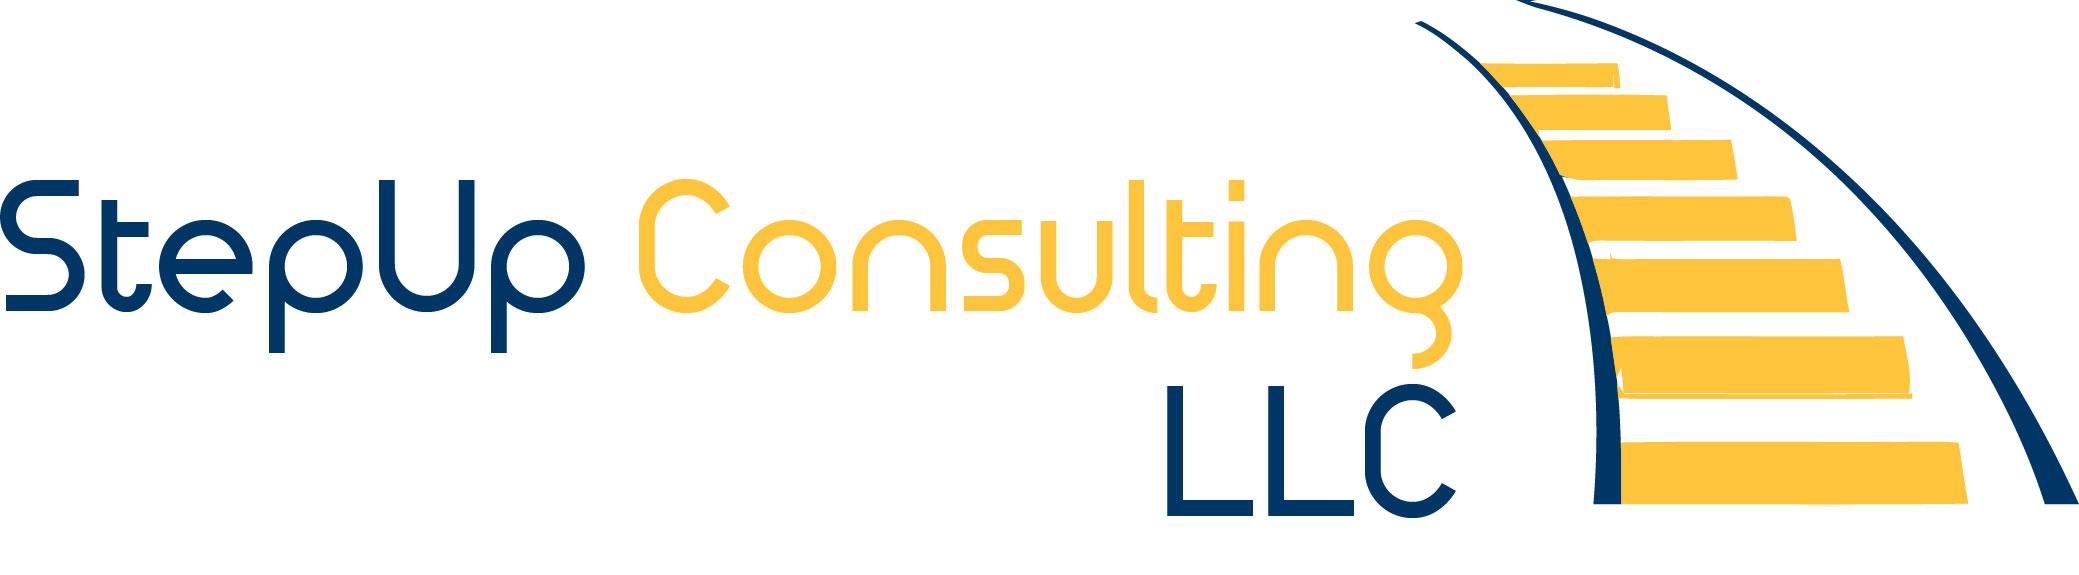 StepUp Consulting LLC